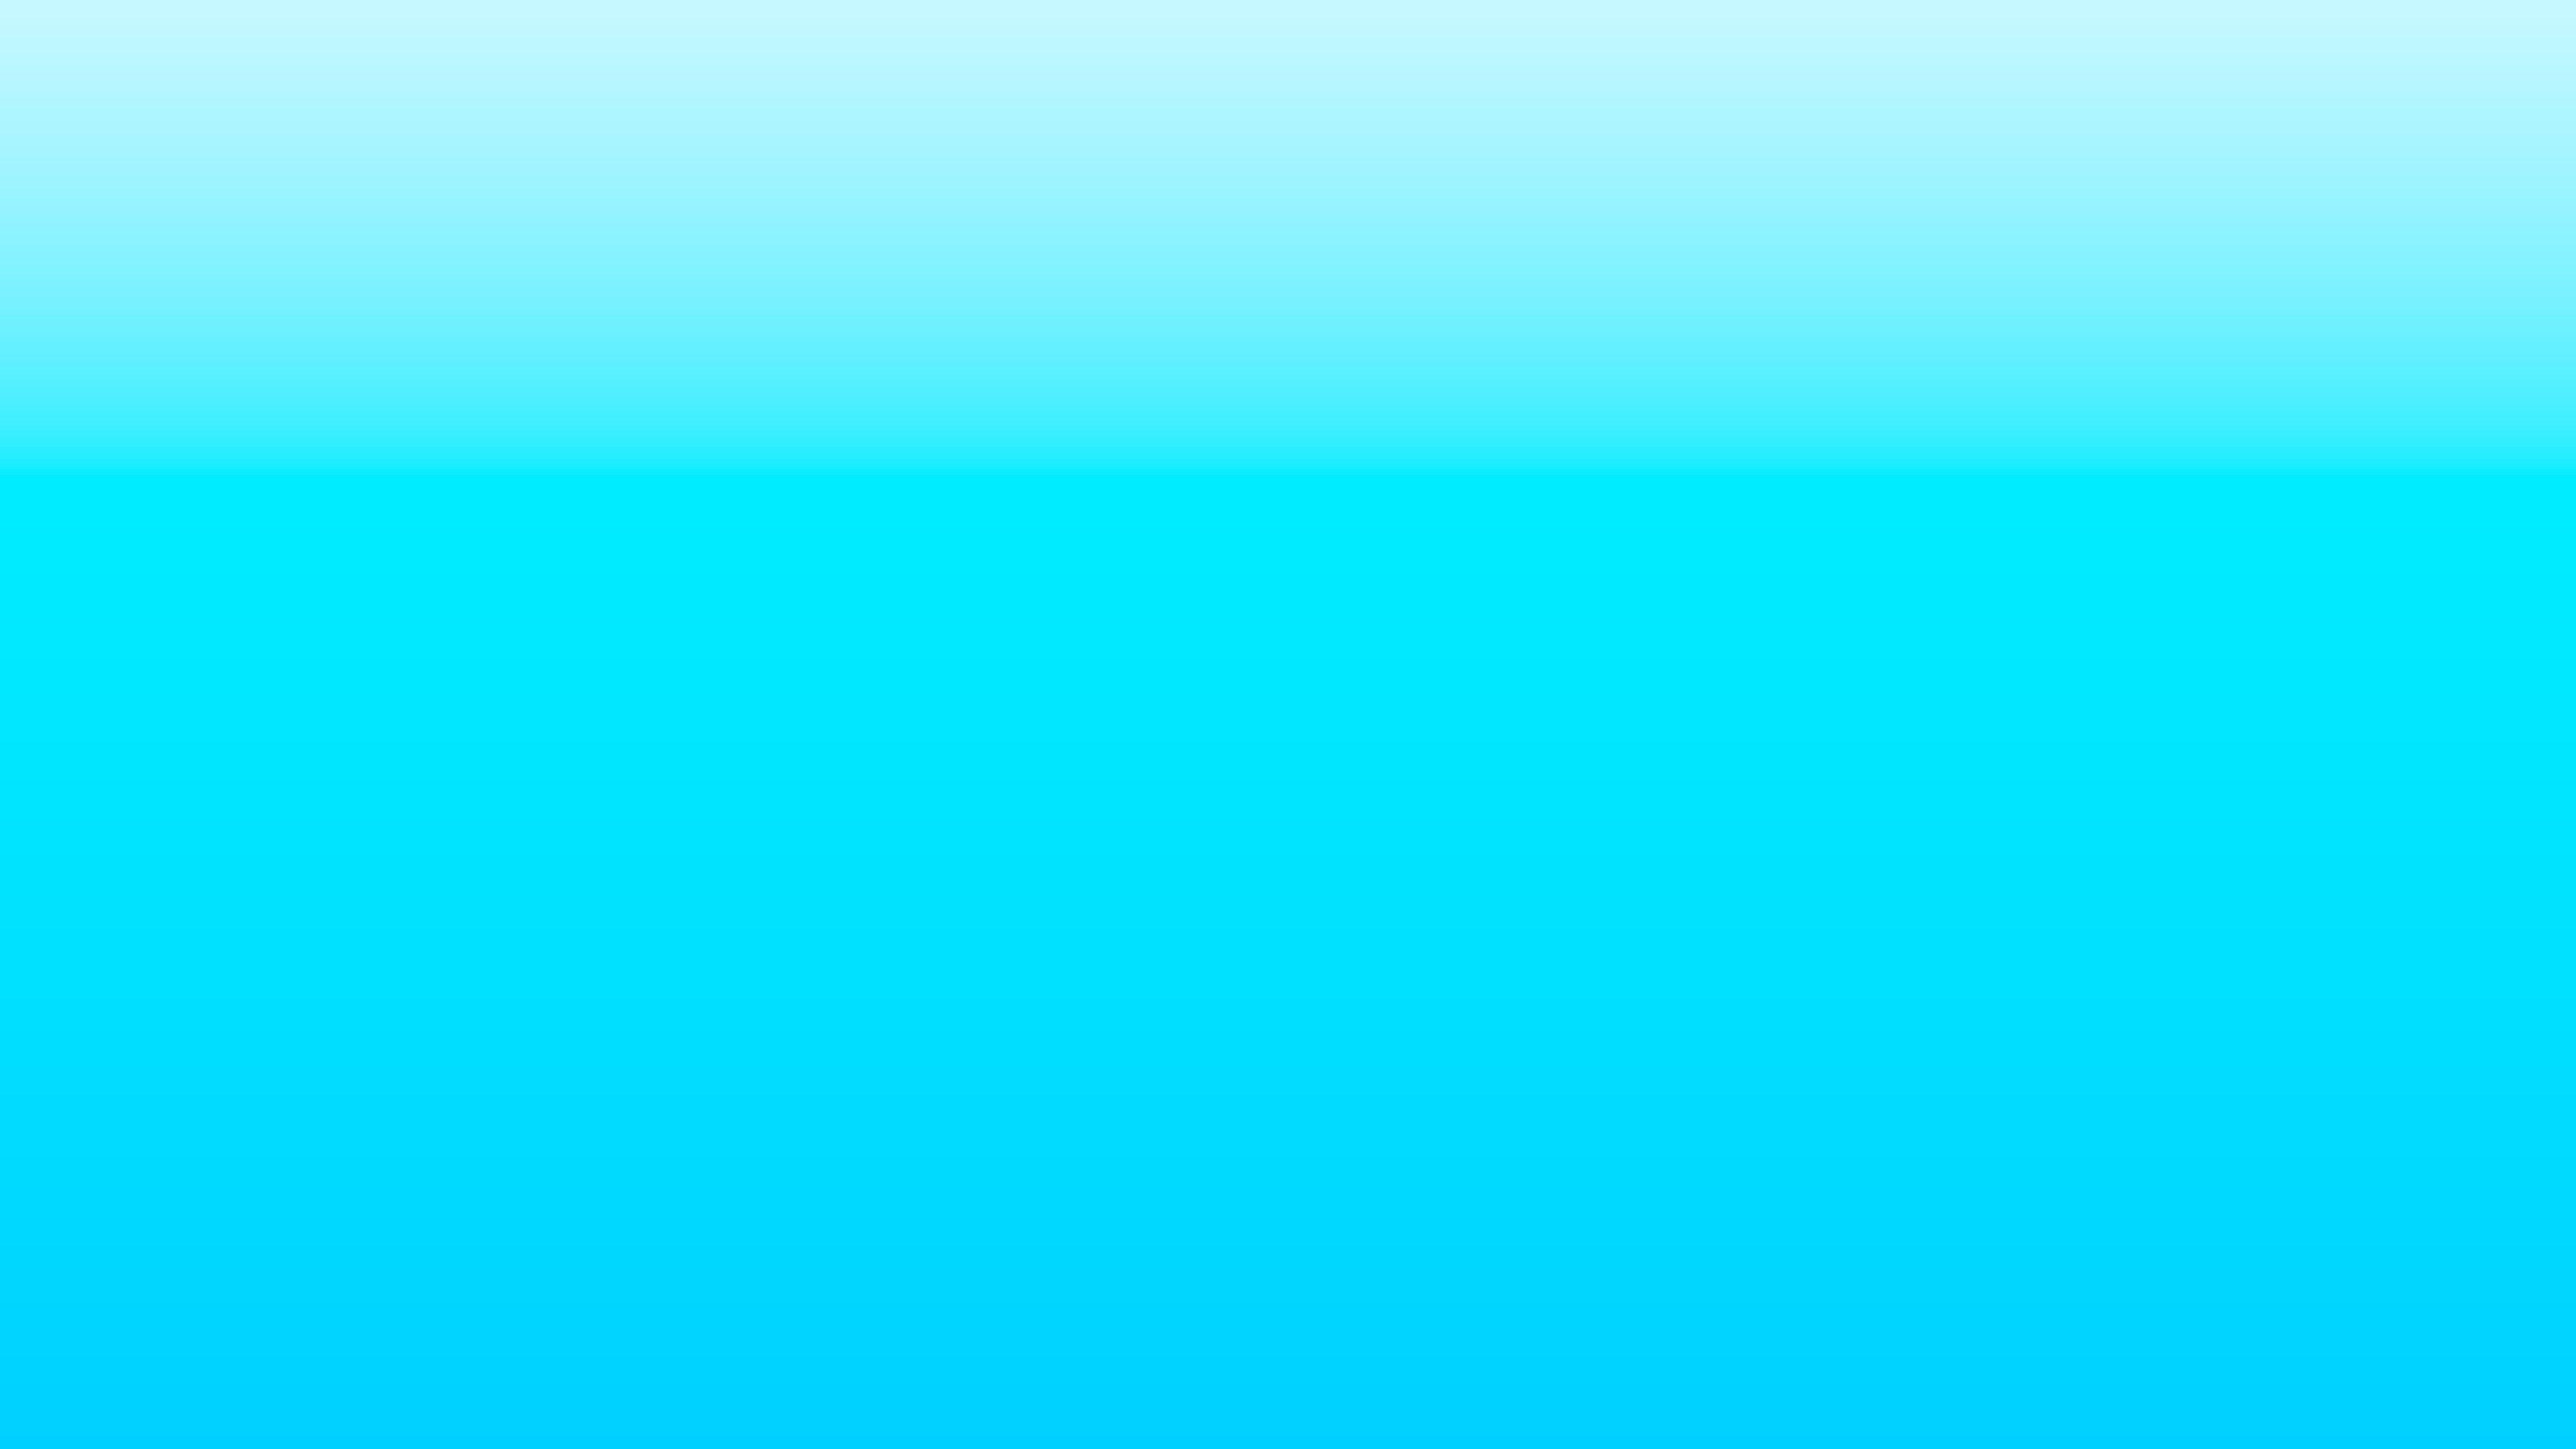 Wallpaper azul claro com branco